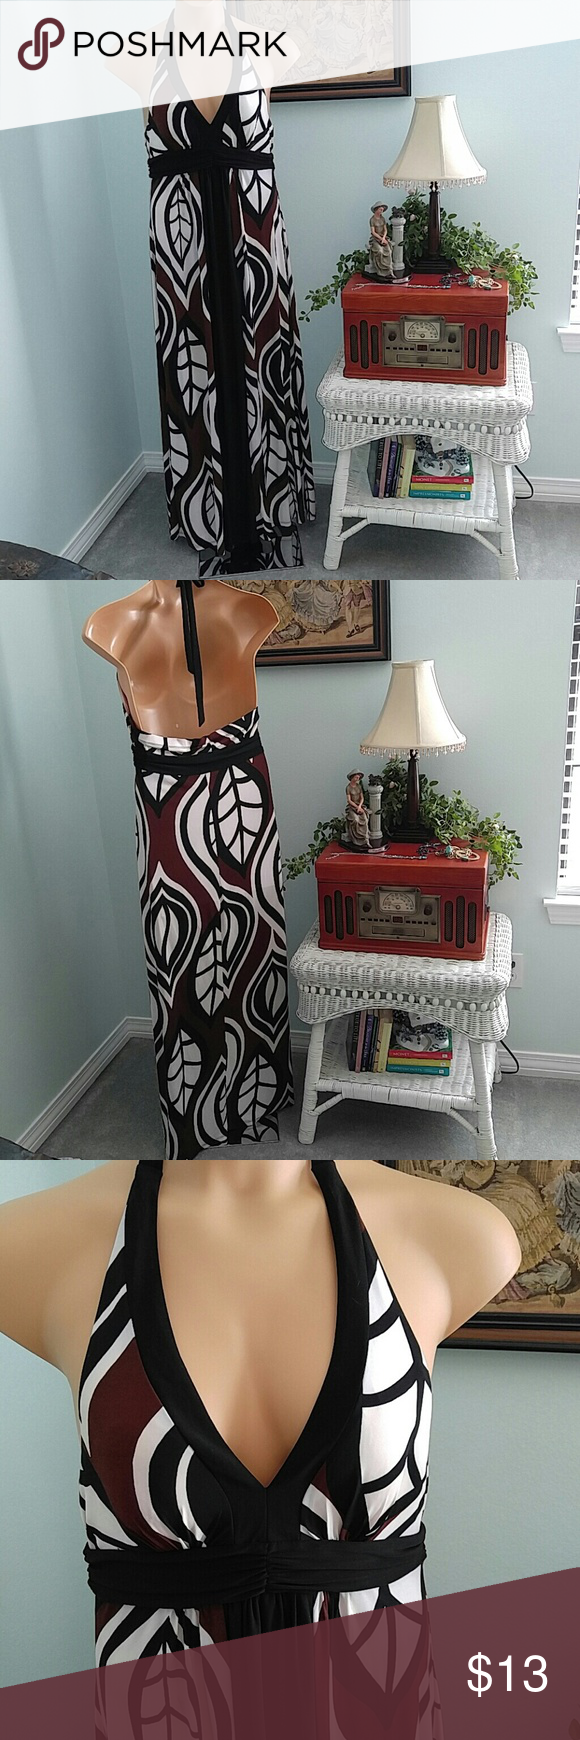 BISOU BISOU Like new. Beautiful halter long dress. No issues. Bisou Bisou Dresses Maxi